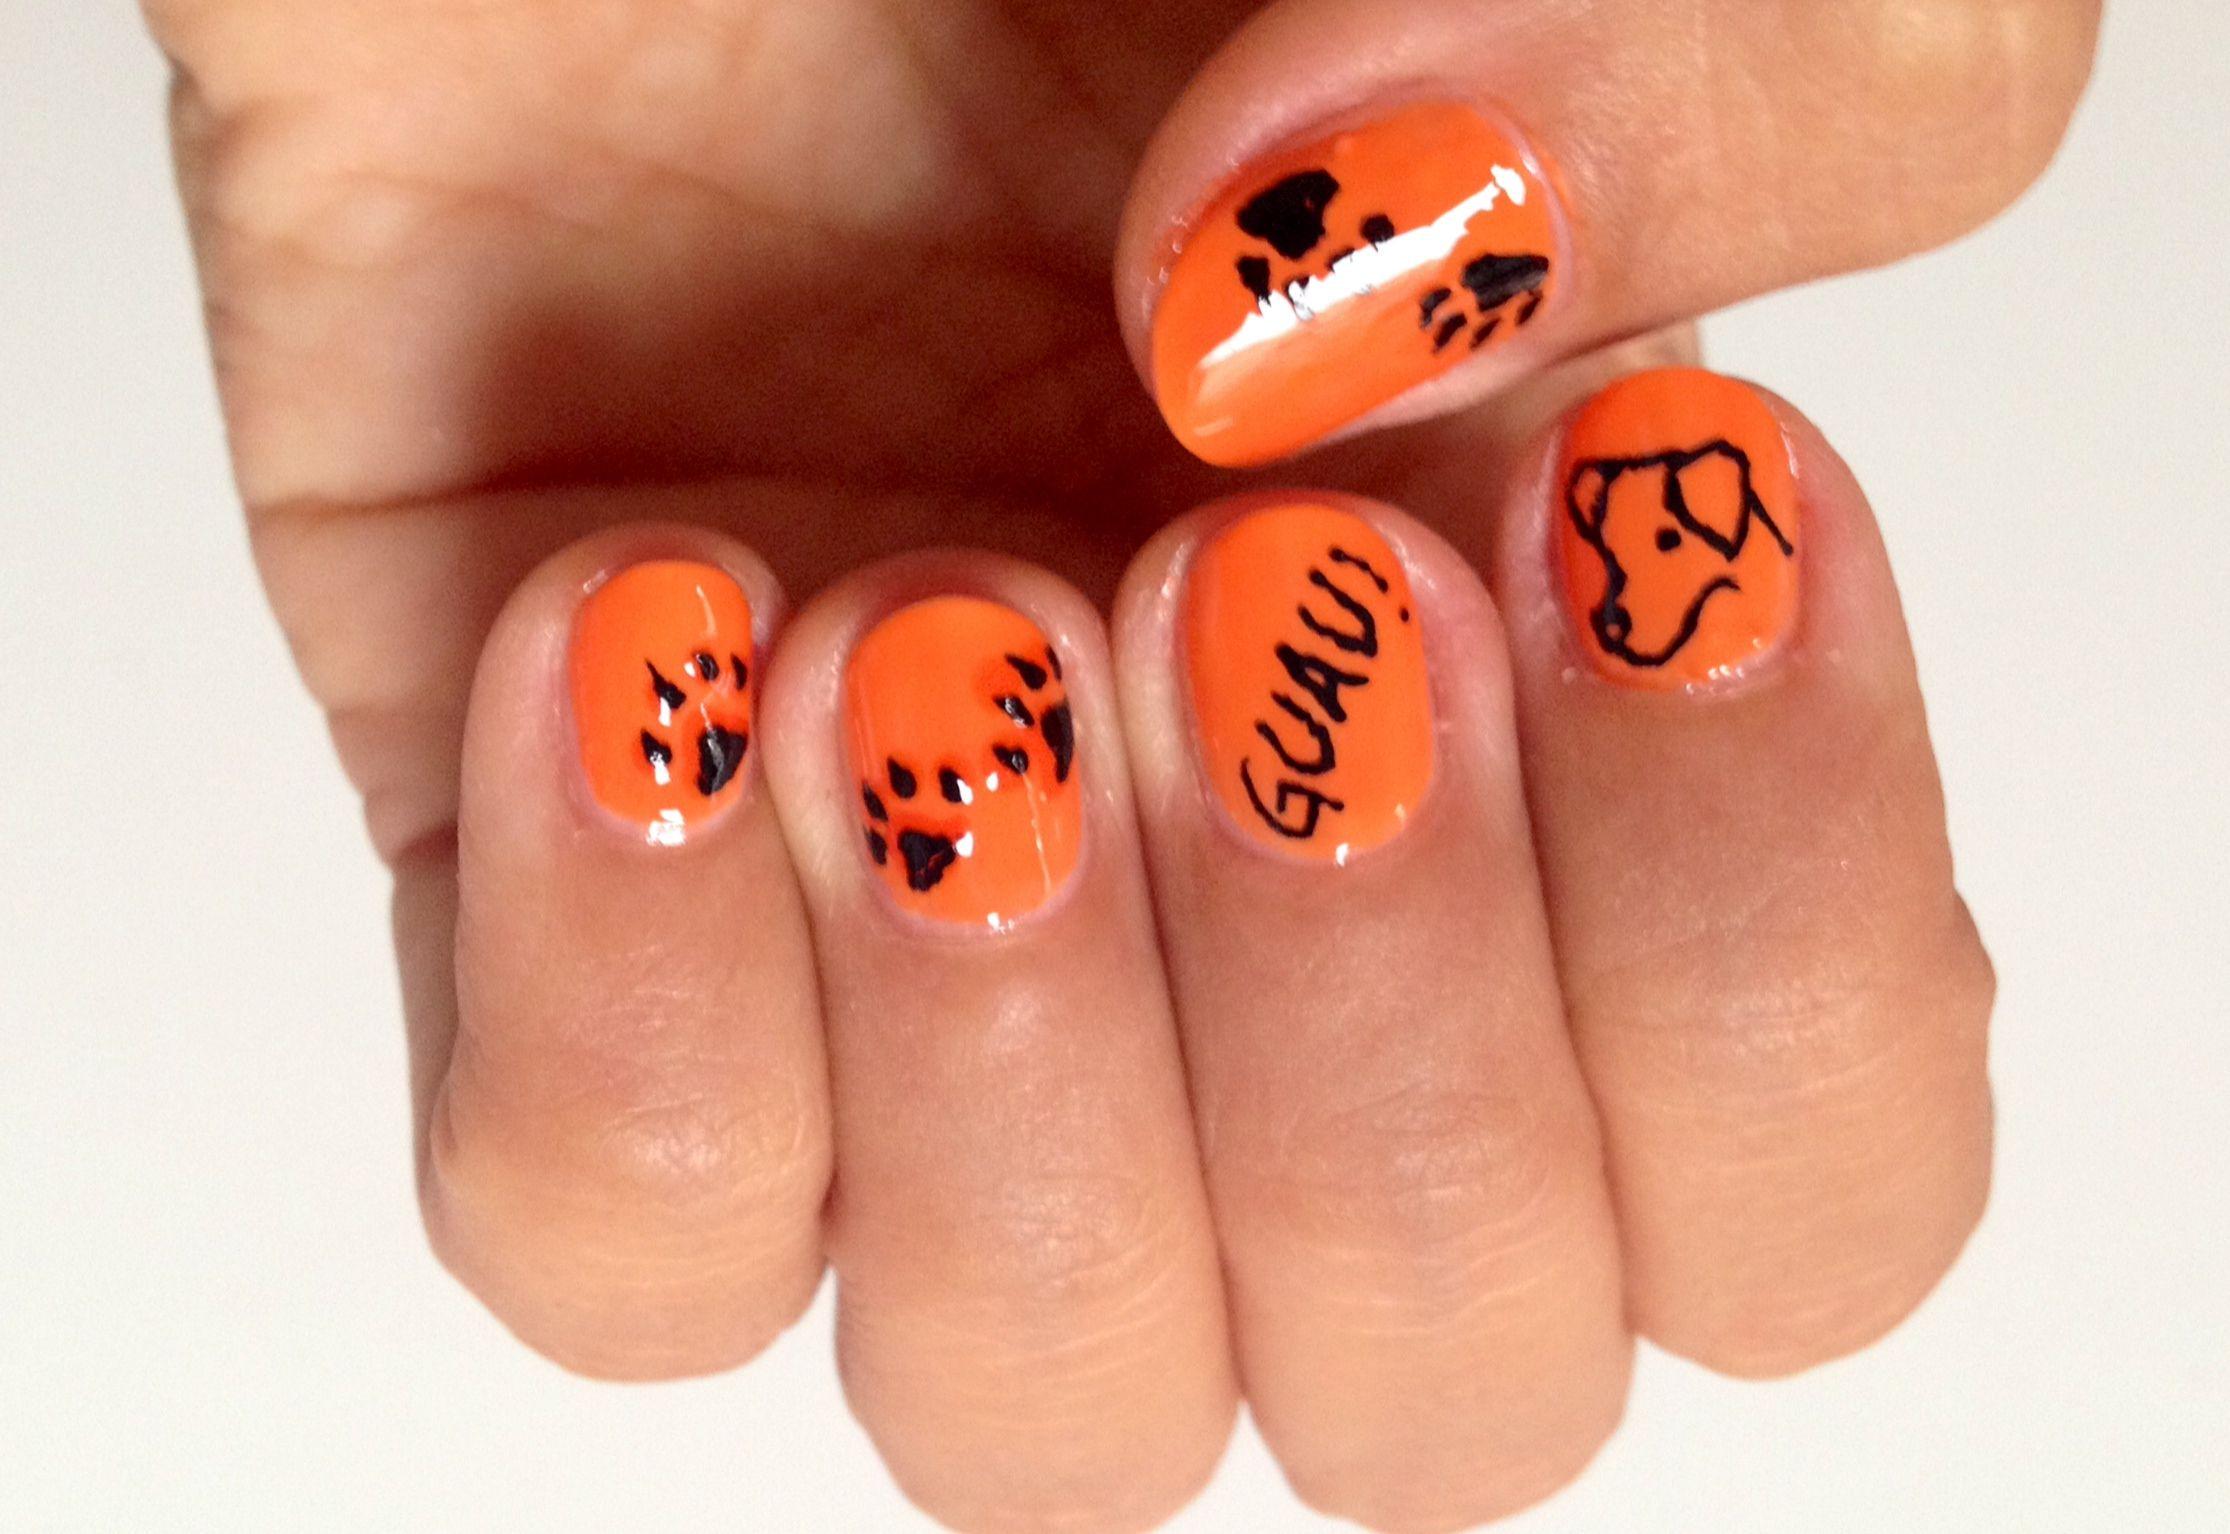 #manicura #nhala #mascota #petinspired #manicure http://amisqueridasmujeres.blogspot.com.es/ https://www.facebook.com/redlipsmakeup?ref=hl http://redlipsmakeupstudio.com/